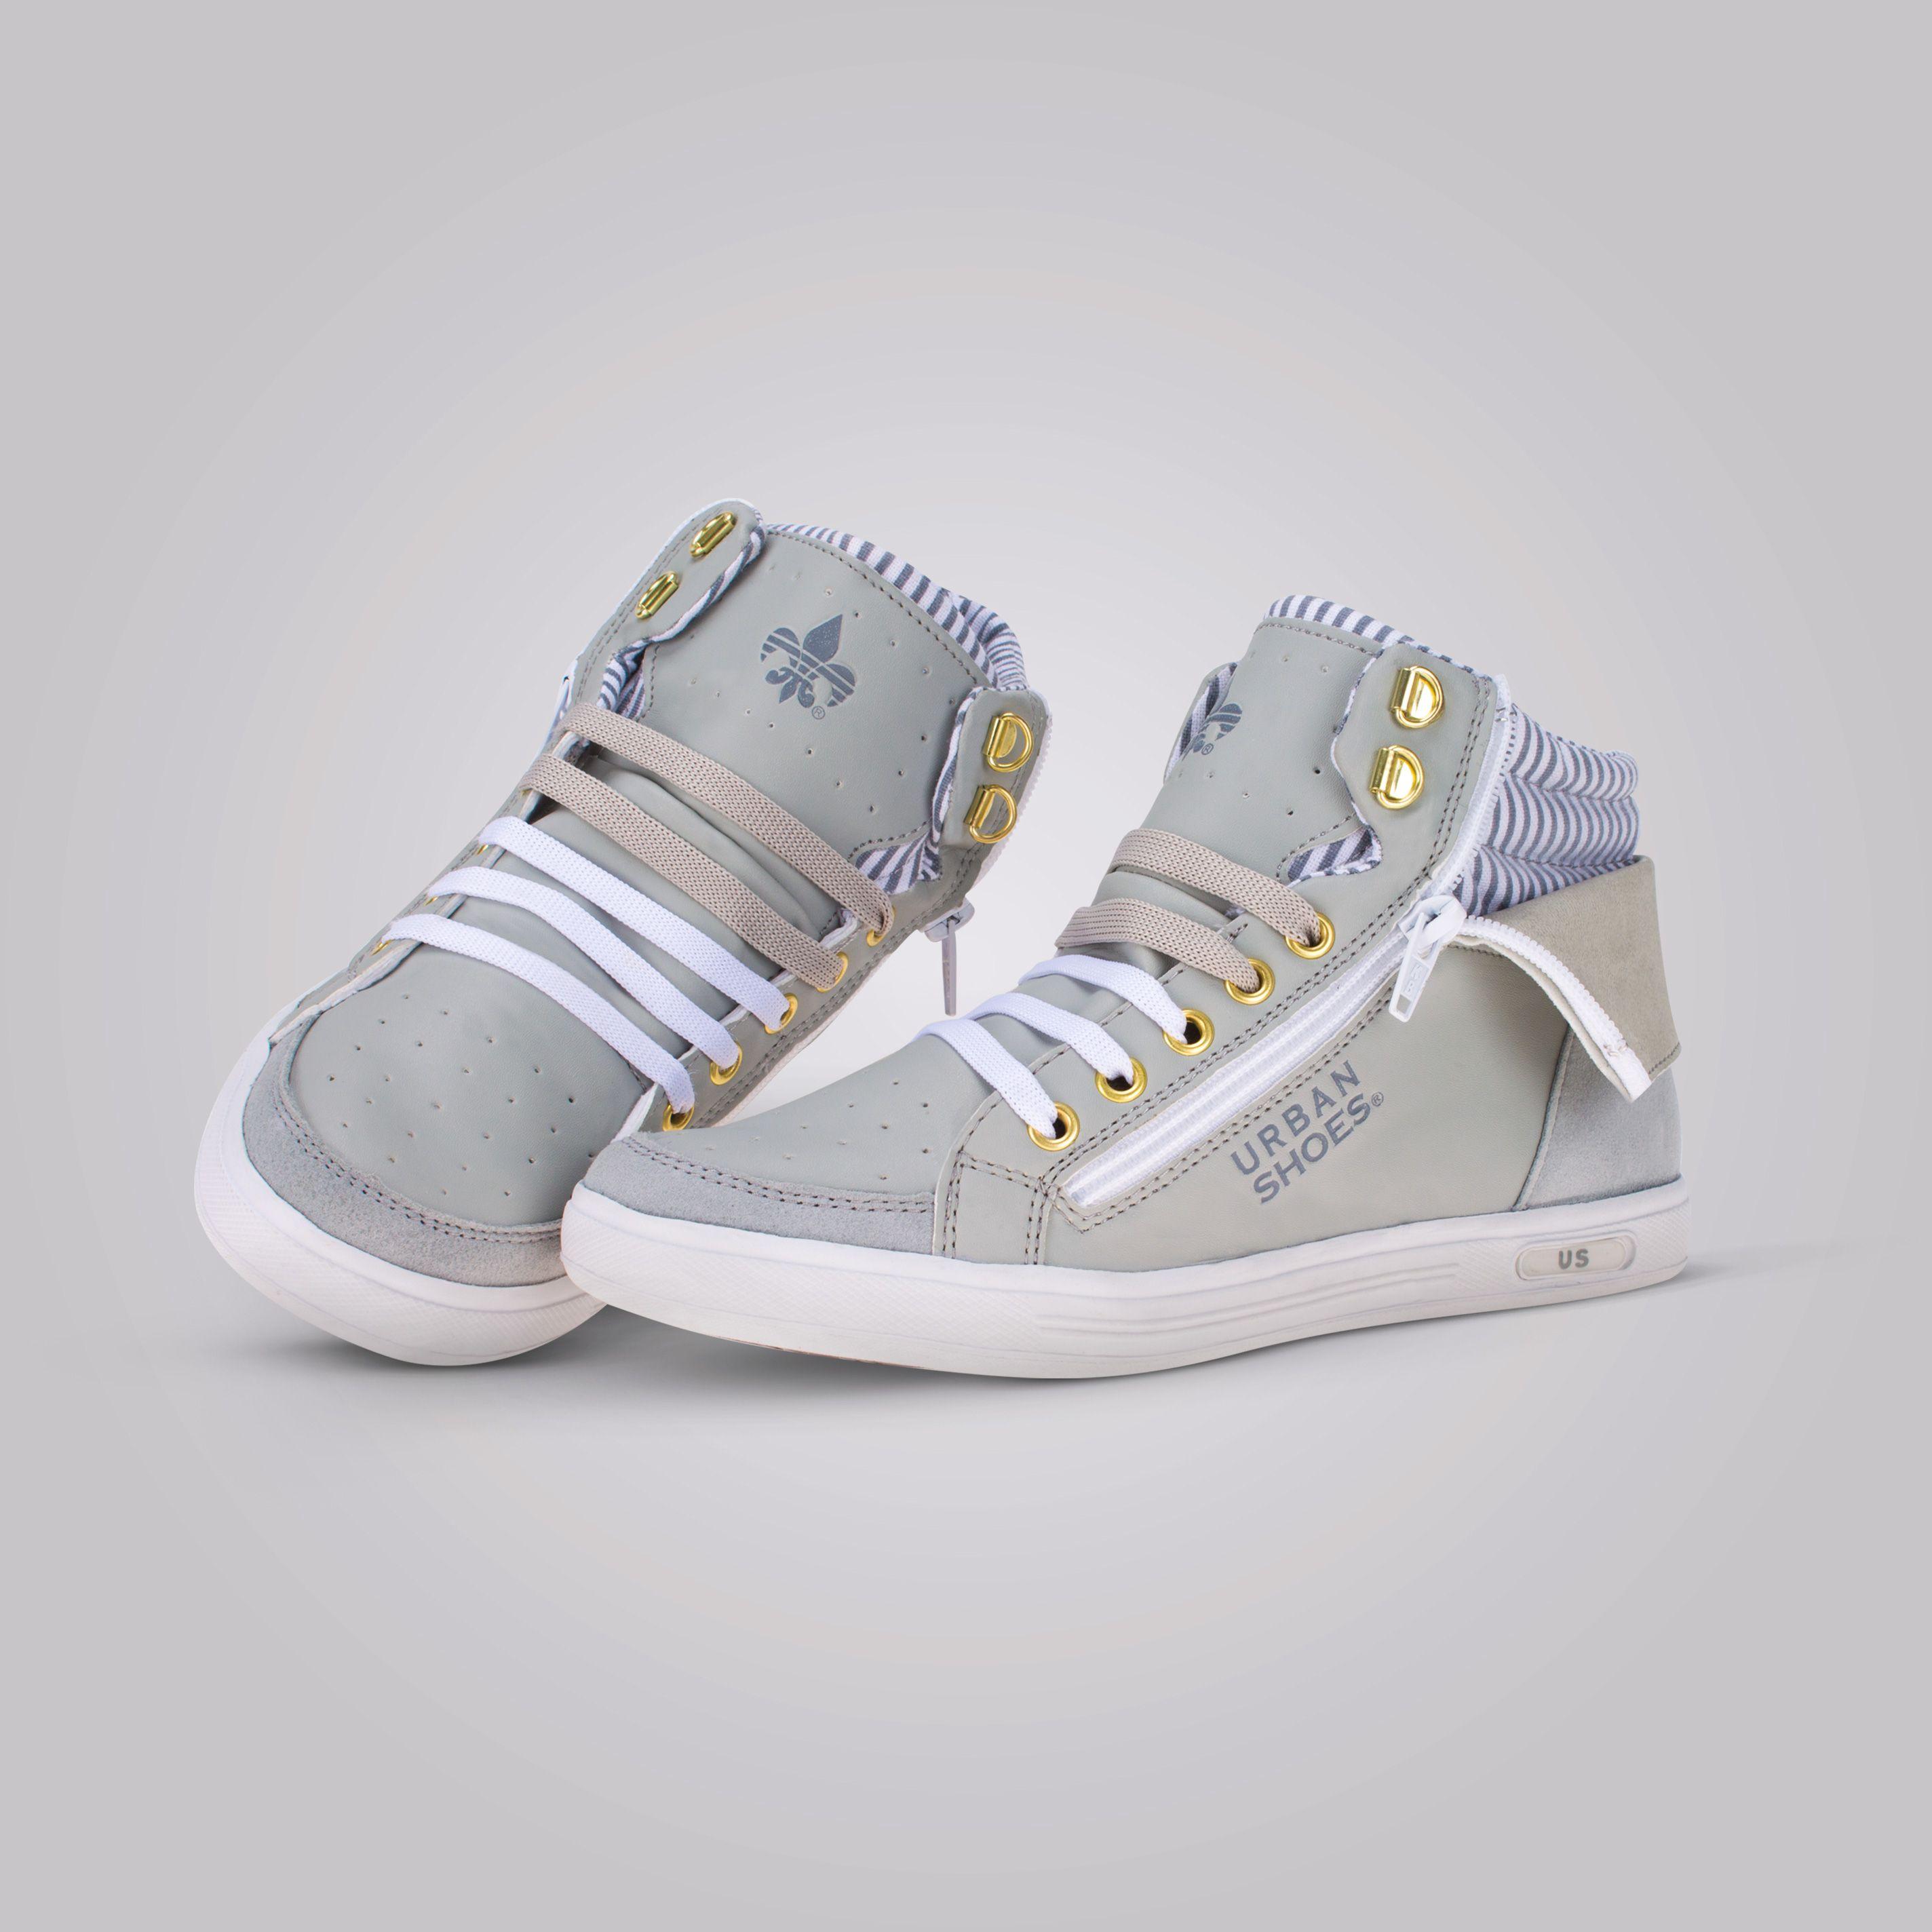 2b4e90bb Un toque juvenil #priceshoes #lamodamasdeseada #botas #urbano. ¡Adquiérelas  en Price Shoes!